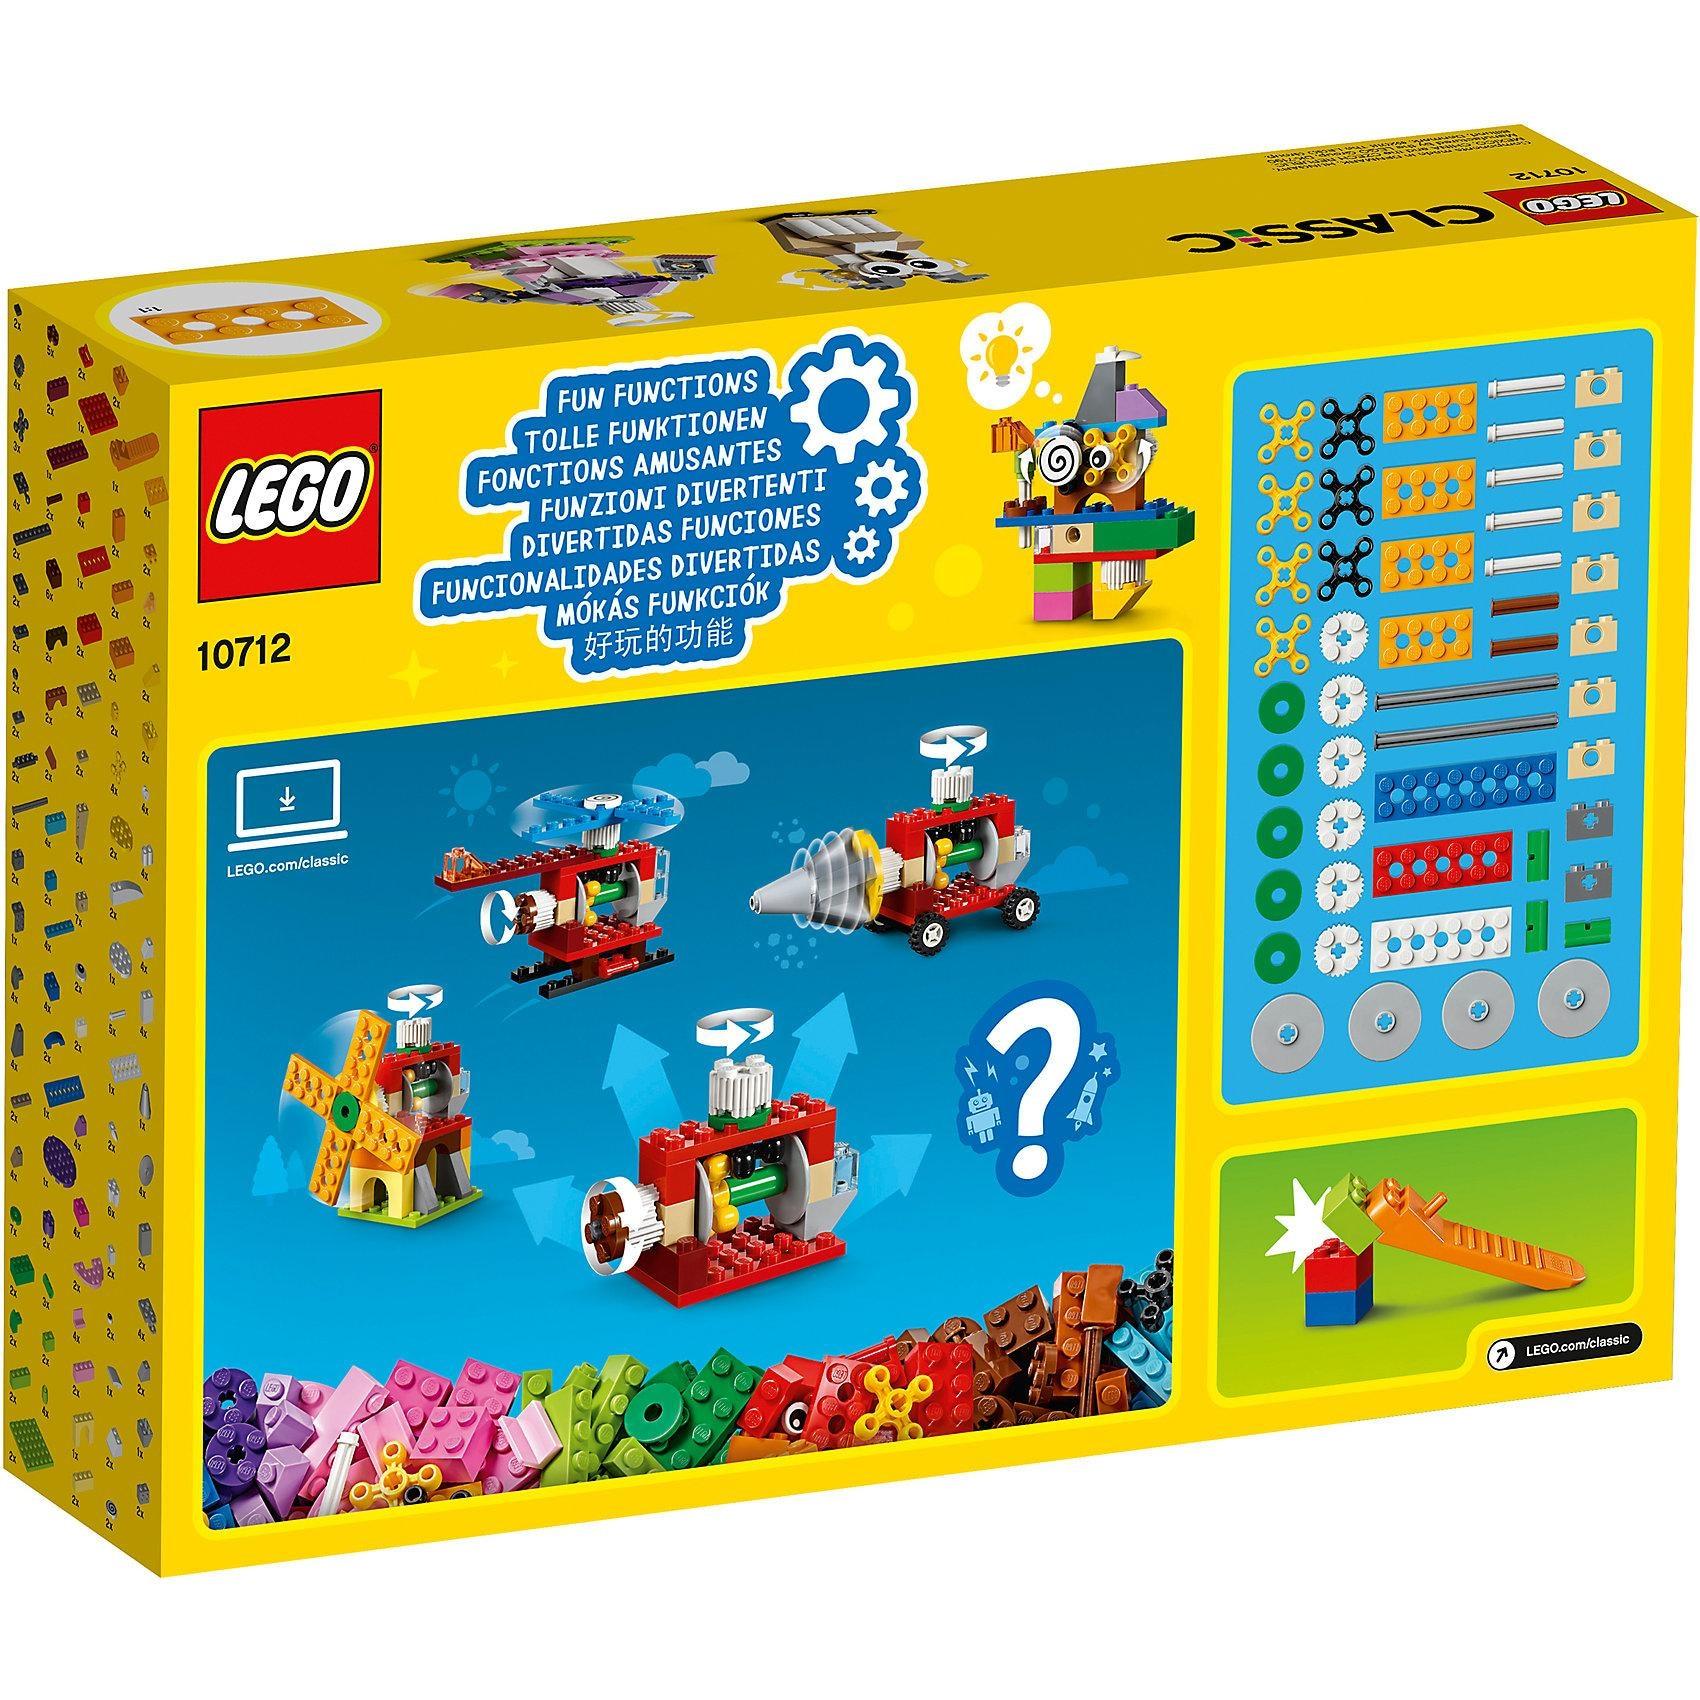 Lego Classics 10712 Zahnräder Bausteine Set